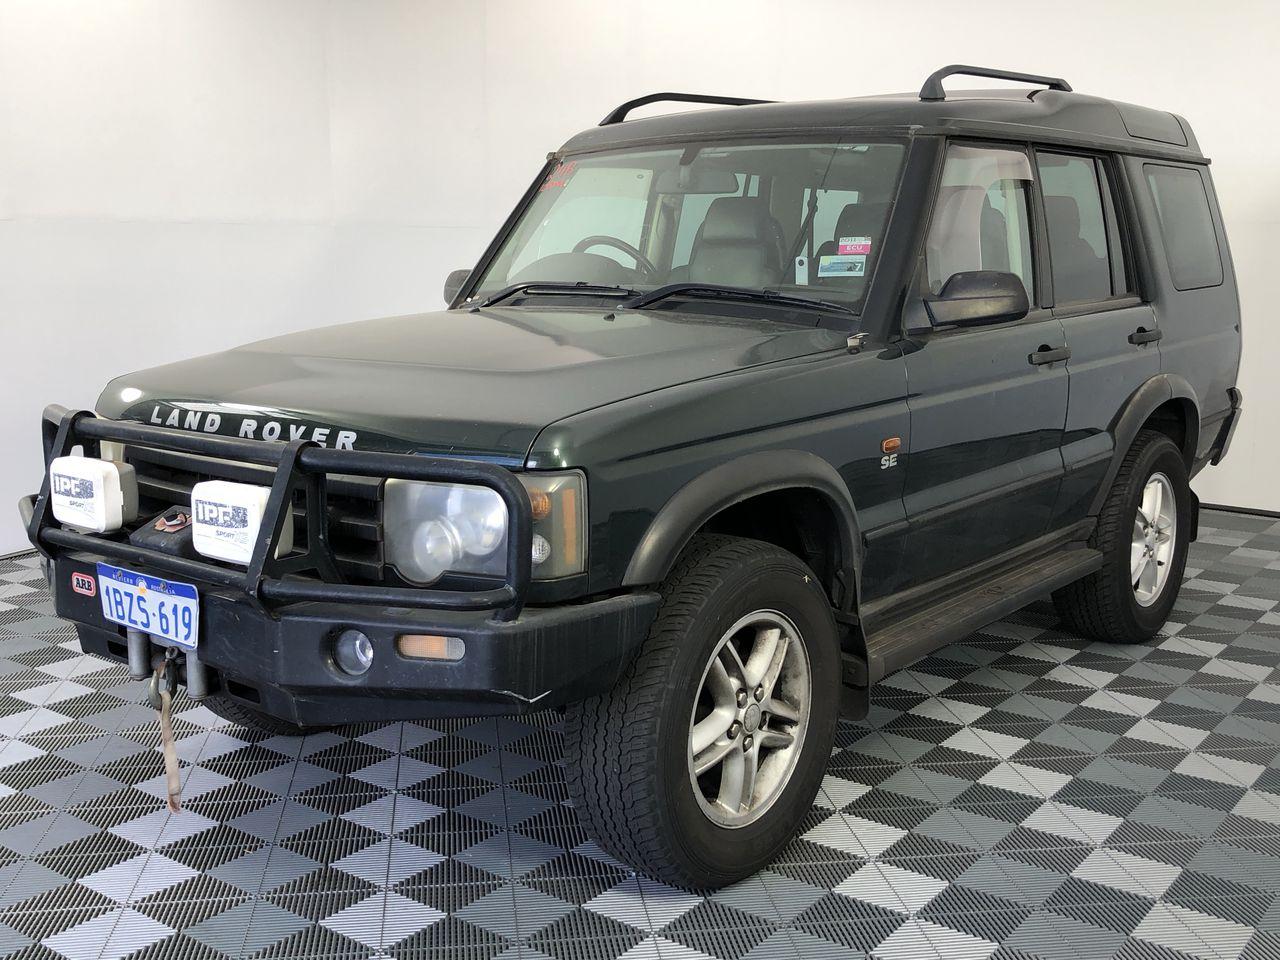 2003 Land Rover Discovery SE (4x4) Automatic 7 Seats Wagon